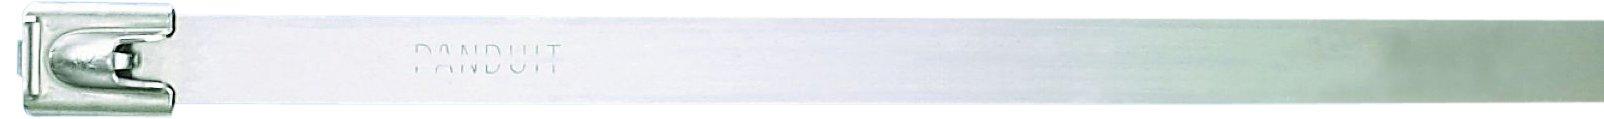 Panduit MLT10H-LP Pan-Steel Self-Locking Cable Tie, General Purpose, Heavy Cross Section, AISI 304 Stainless Steel, 10.0'' Max Bundle Diameter, 0.50'' Min Bundle Diameter, 450lbs Min Tensile Strength, 0.010'' Thickness, 0.31'' Width, 33.0'' Length (Pack of 50)